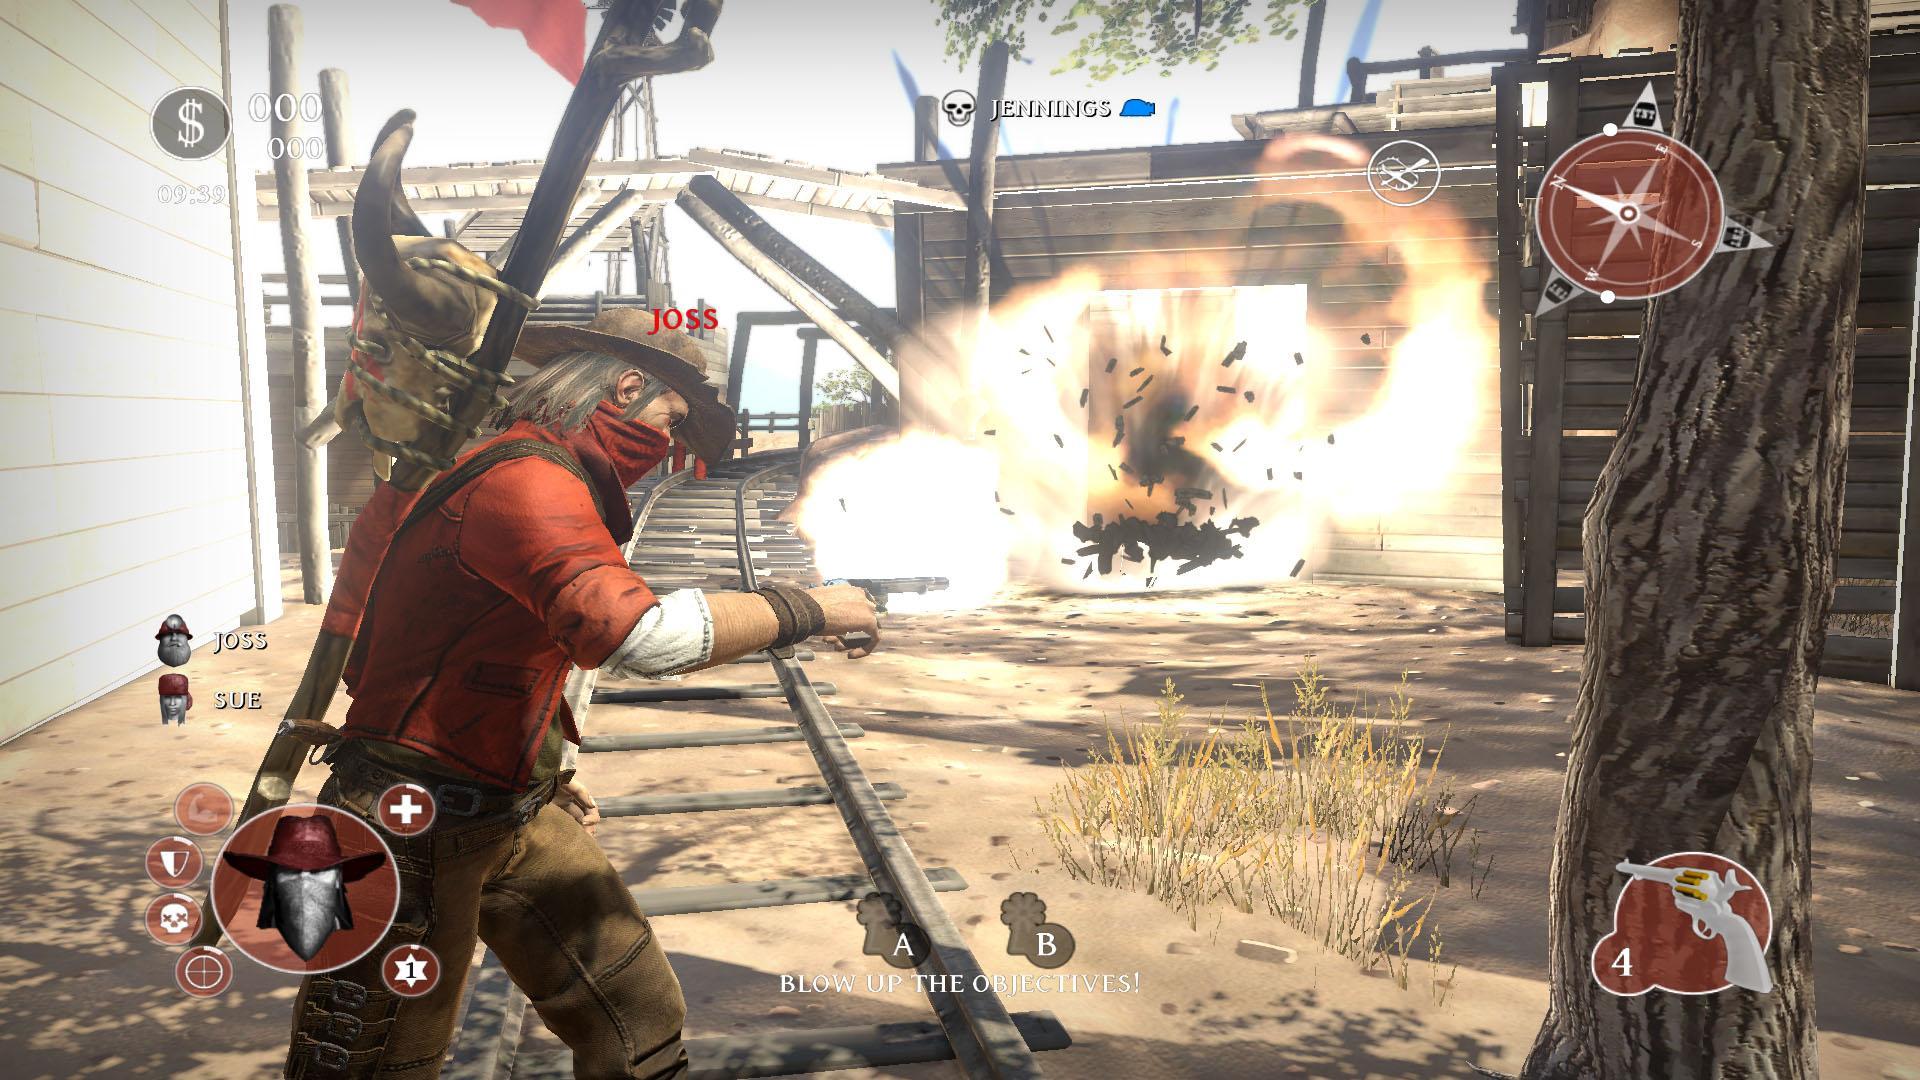 Fatshark Giving Away 100K Keys For Its Team Based Shooter